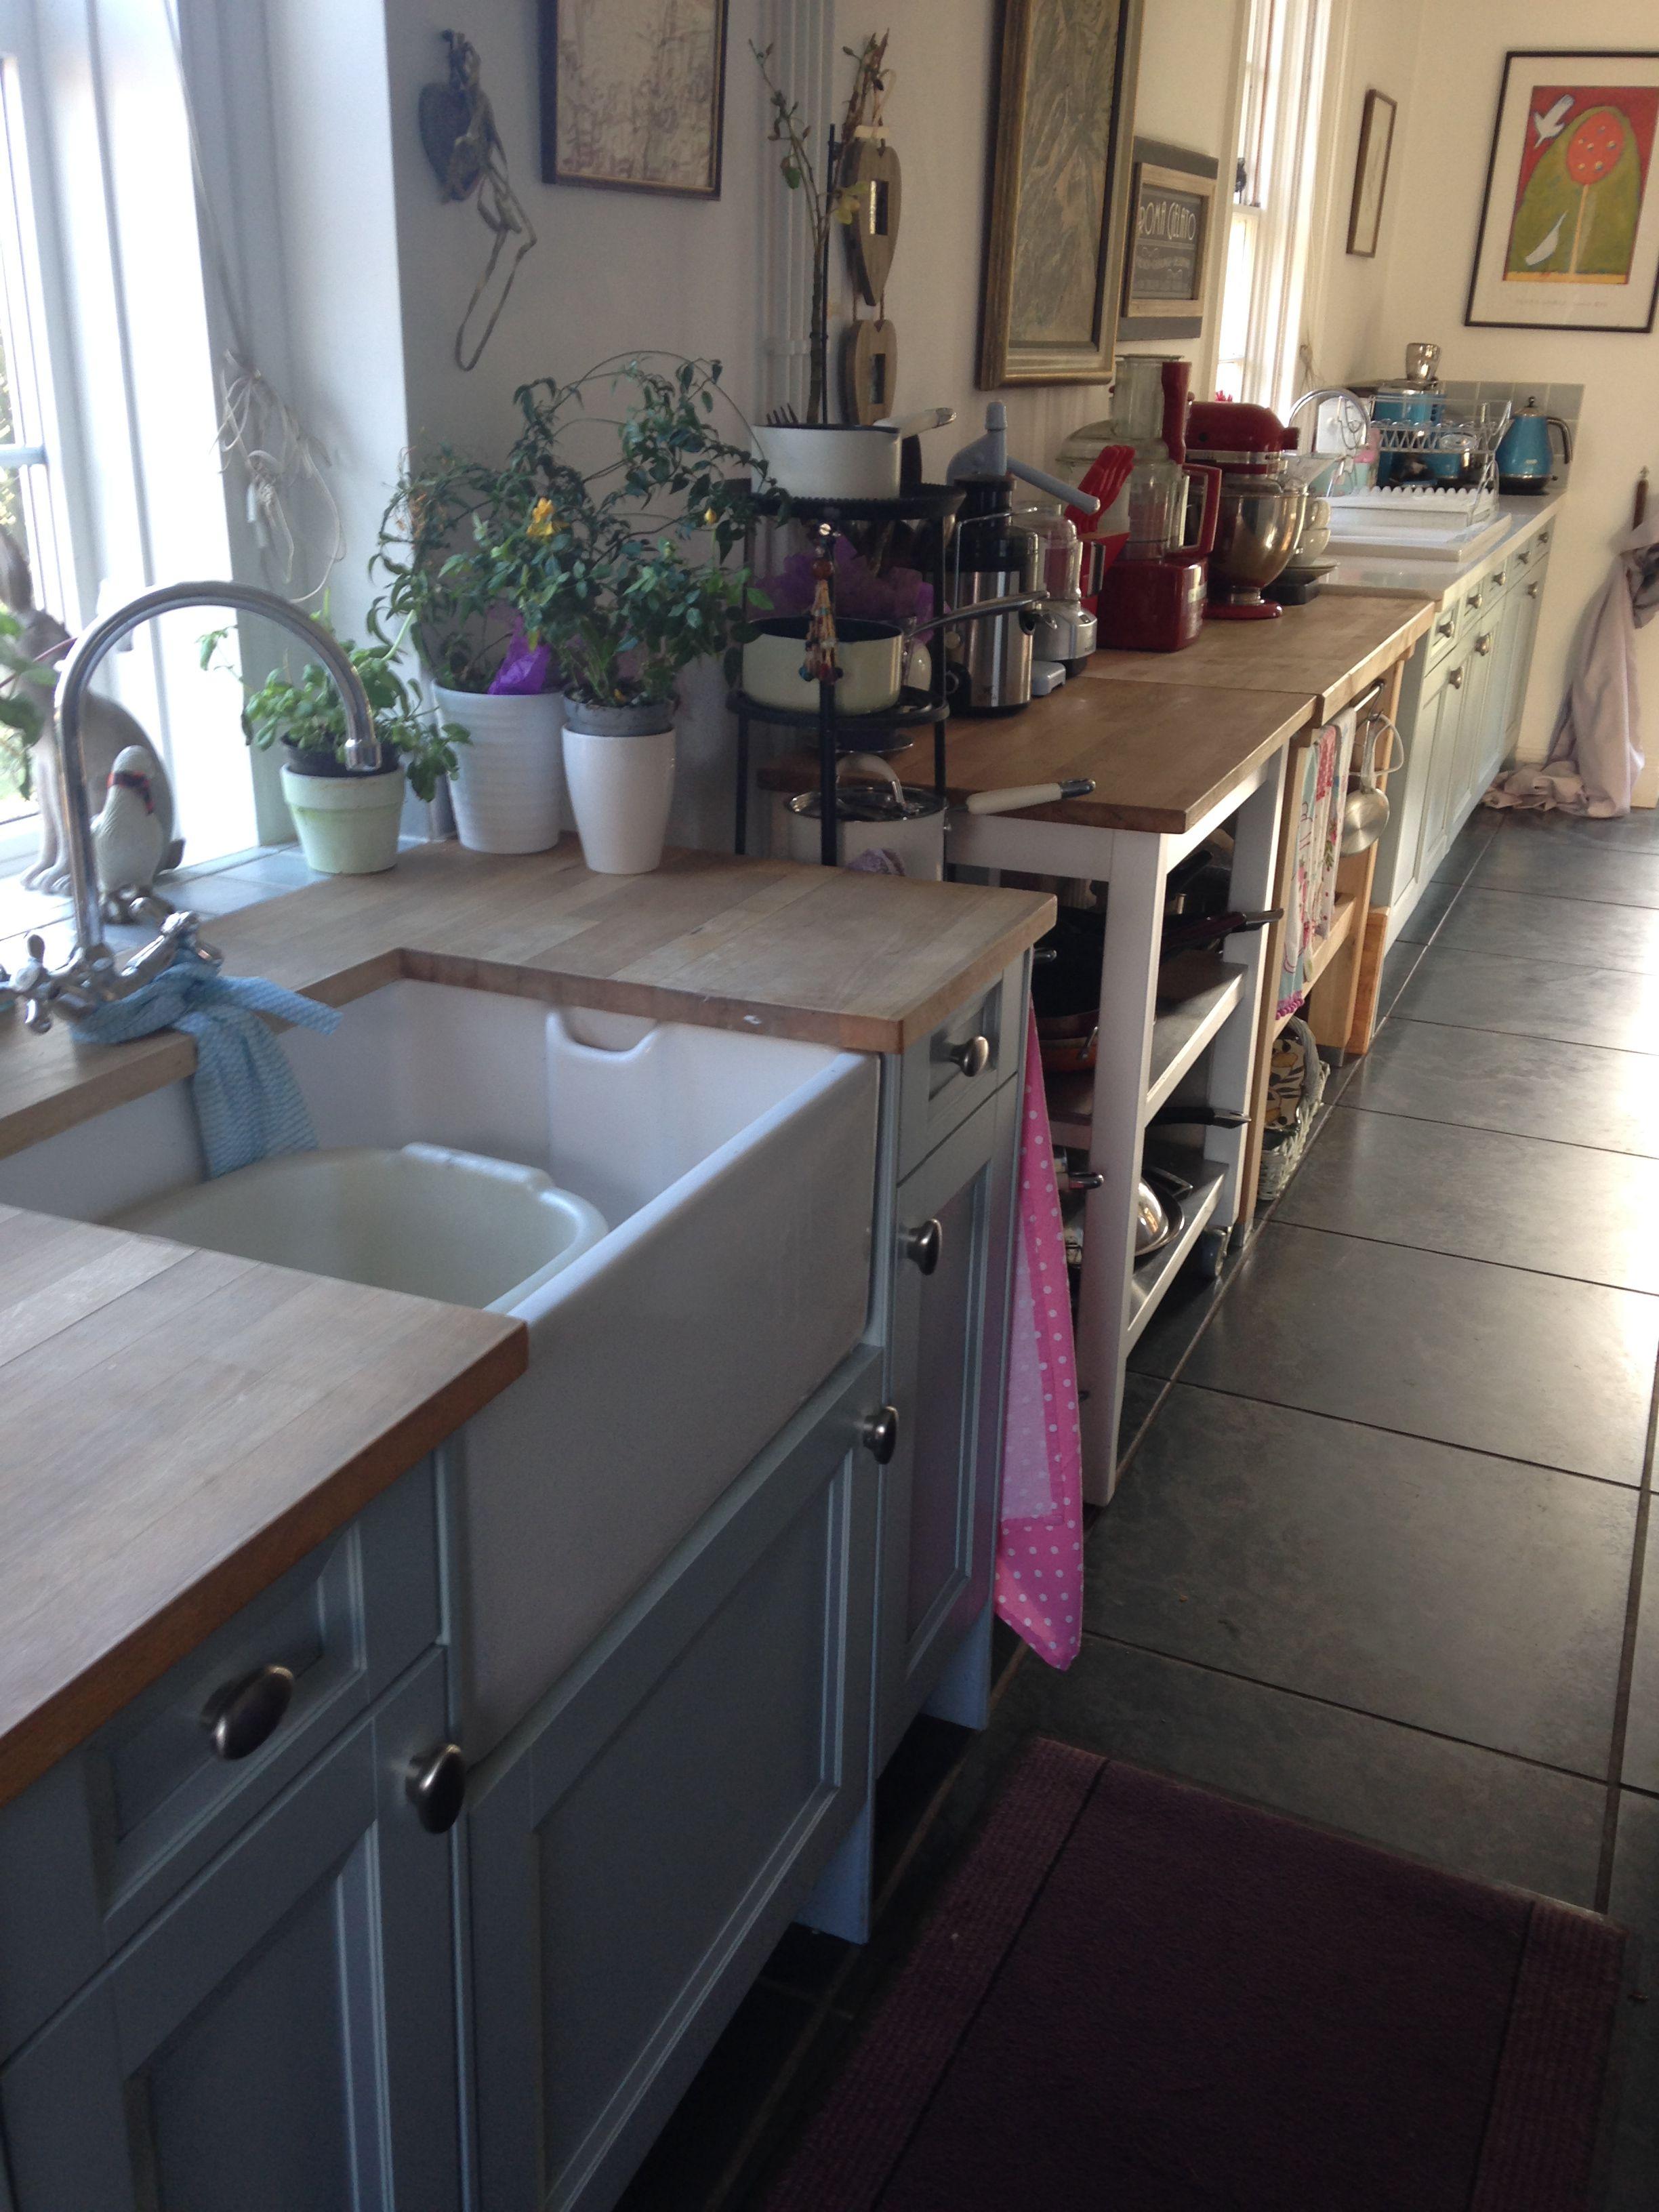 Freestanding Kitchen Units Wooden Block Tops Shelving 2 More ...